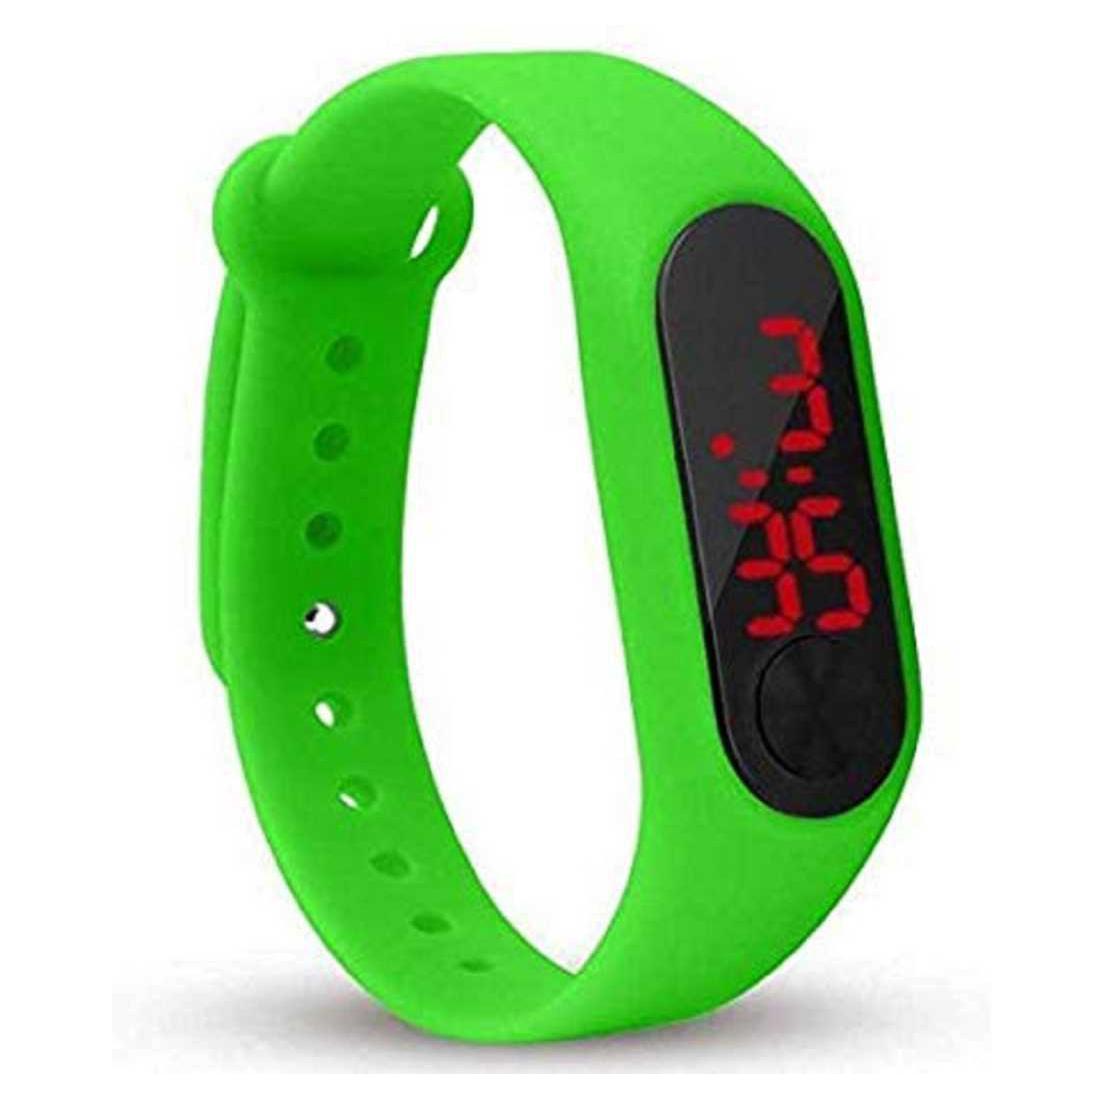 Varni Retail Rubber Magnet New LedGreen Digital Watch M2 LED RED   For Boys Girls